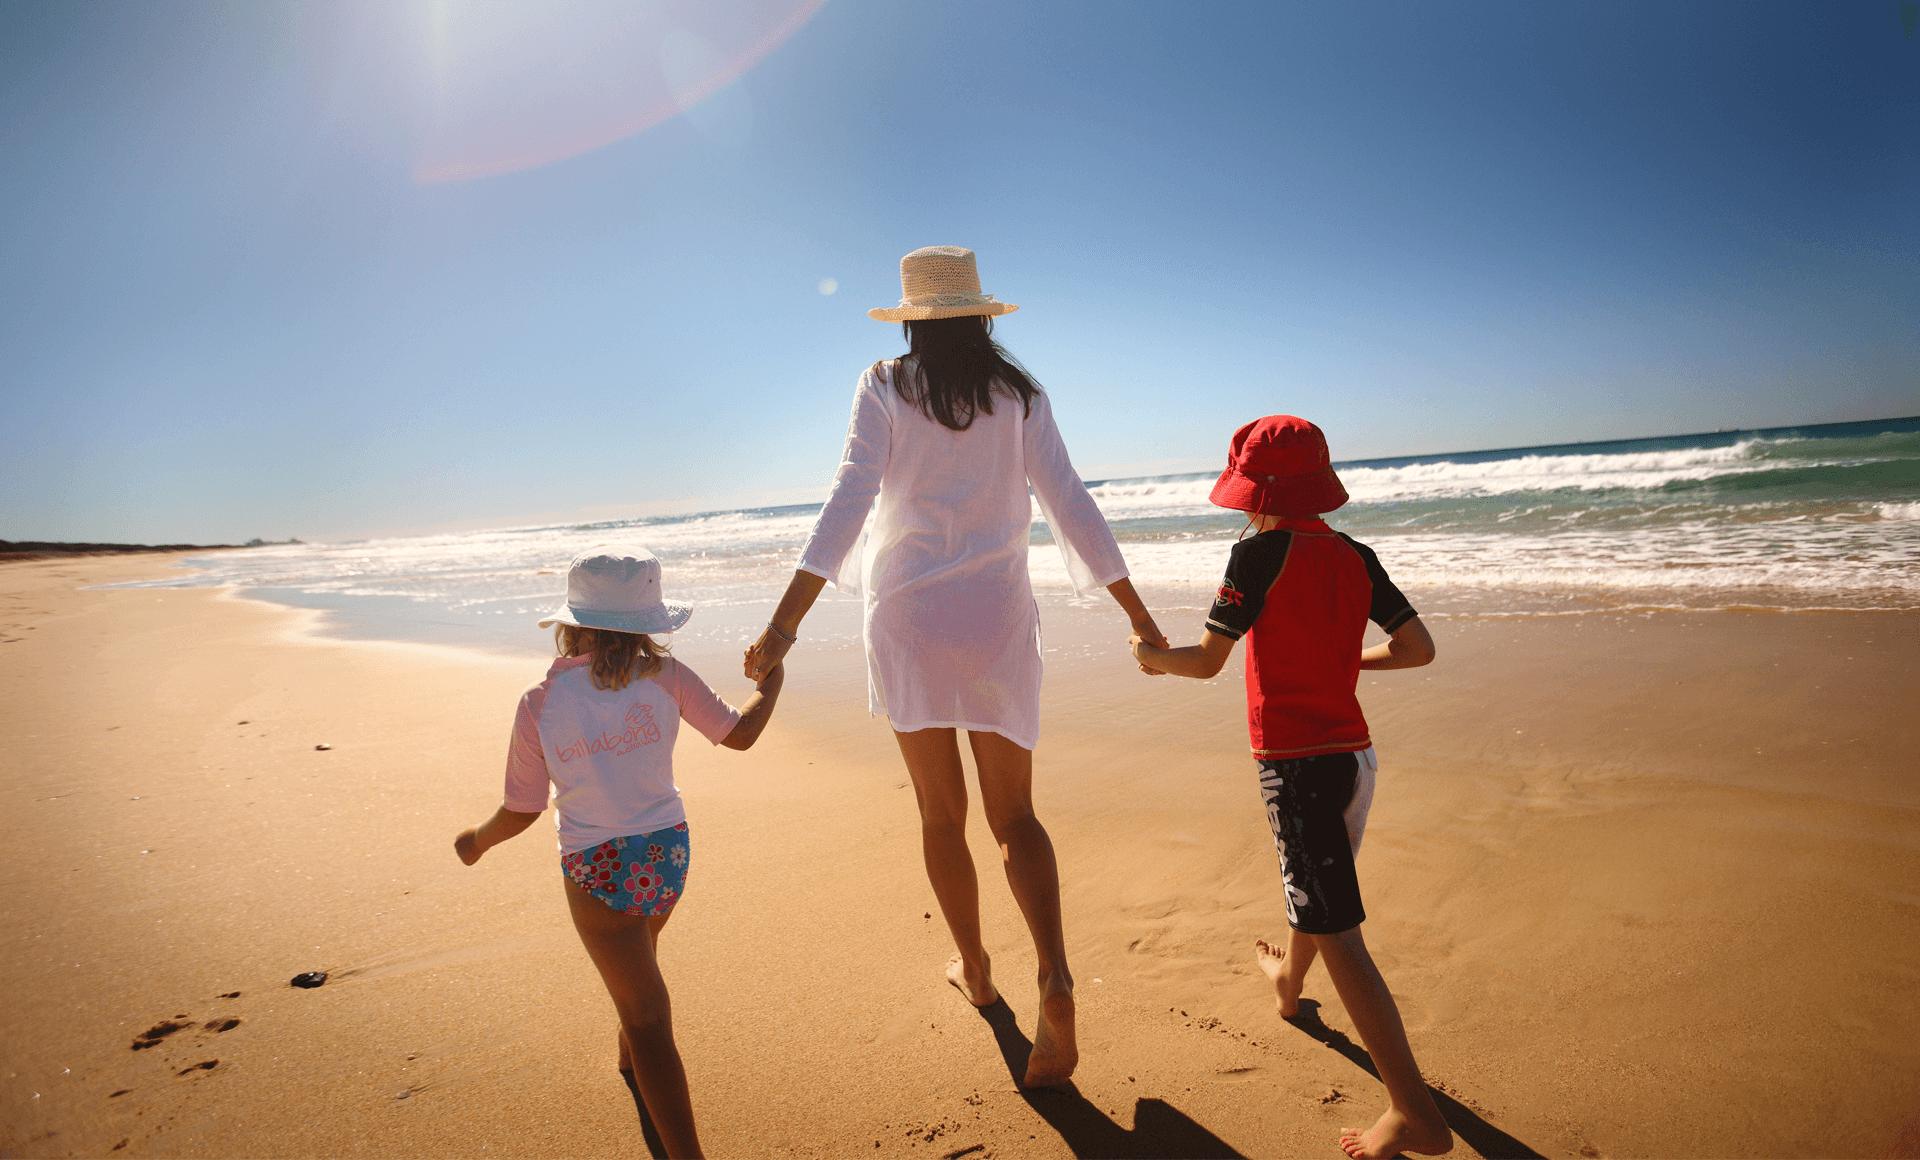 Family holidays made easy on the Sunshine Coast